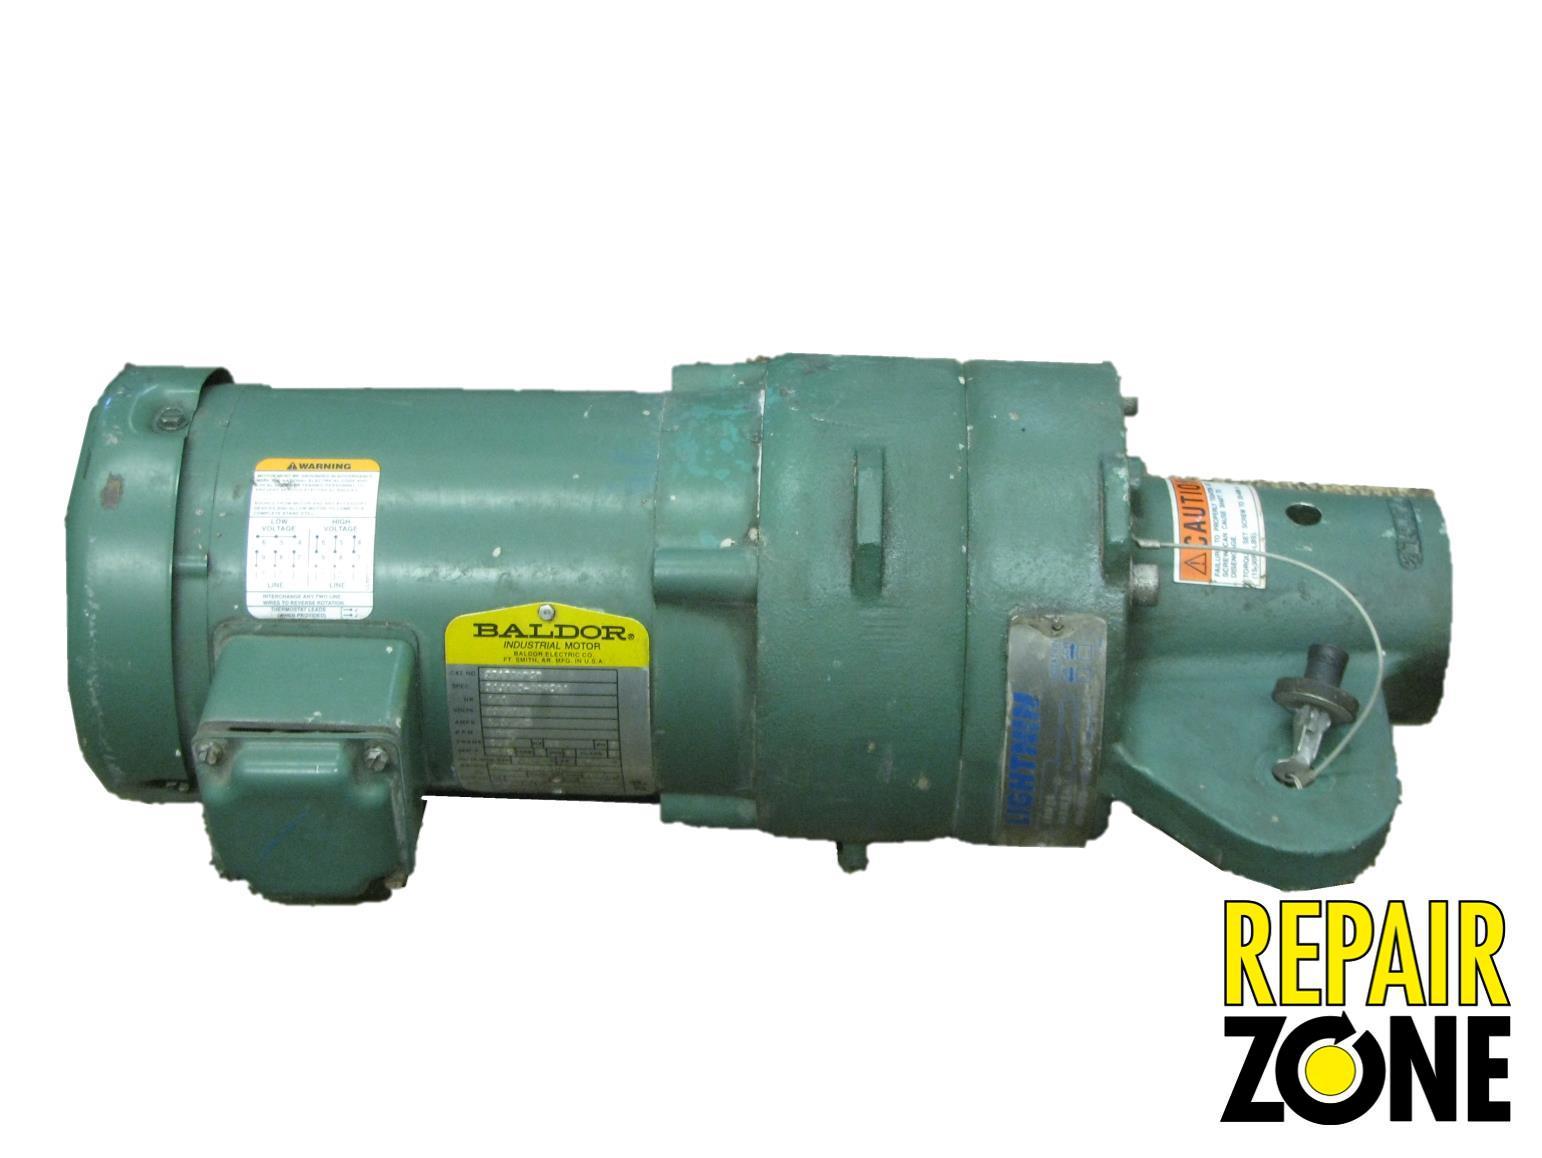 271786psp Baldor Pump Motors Remanufactured Ebay